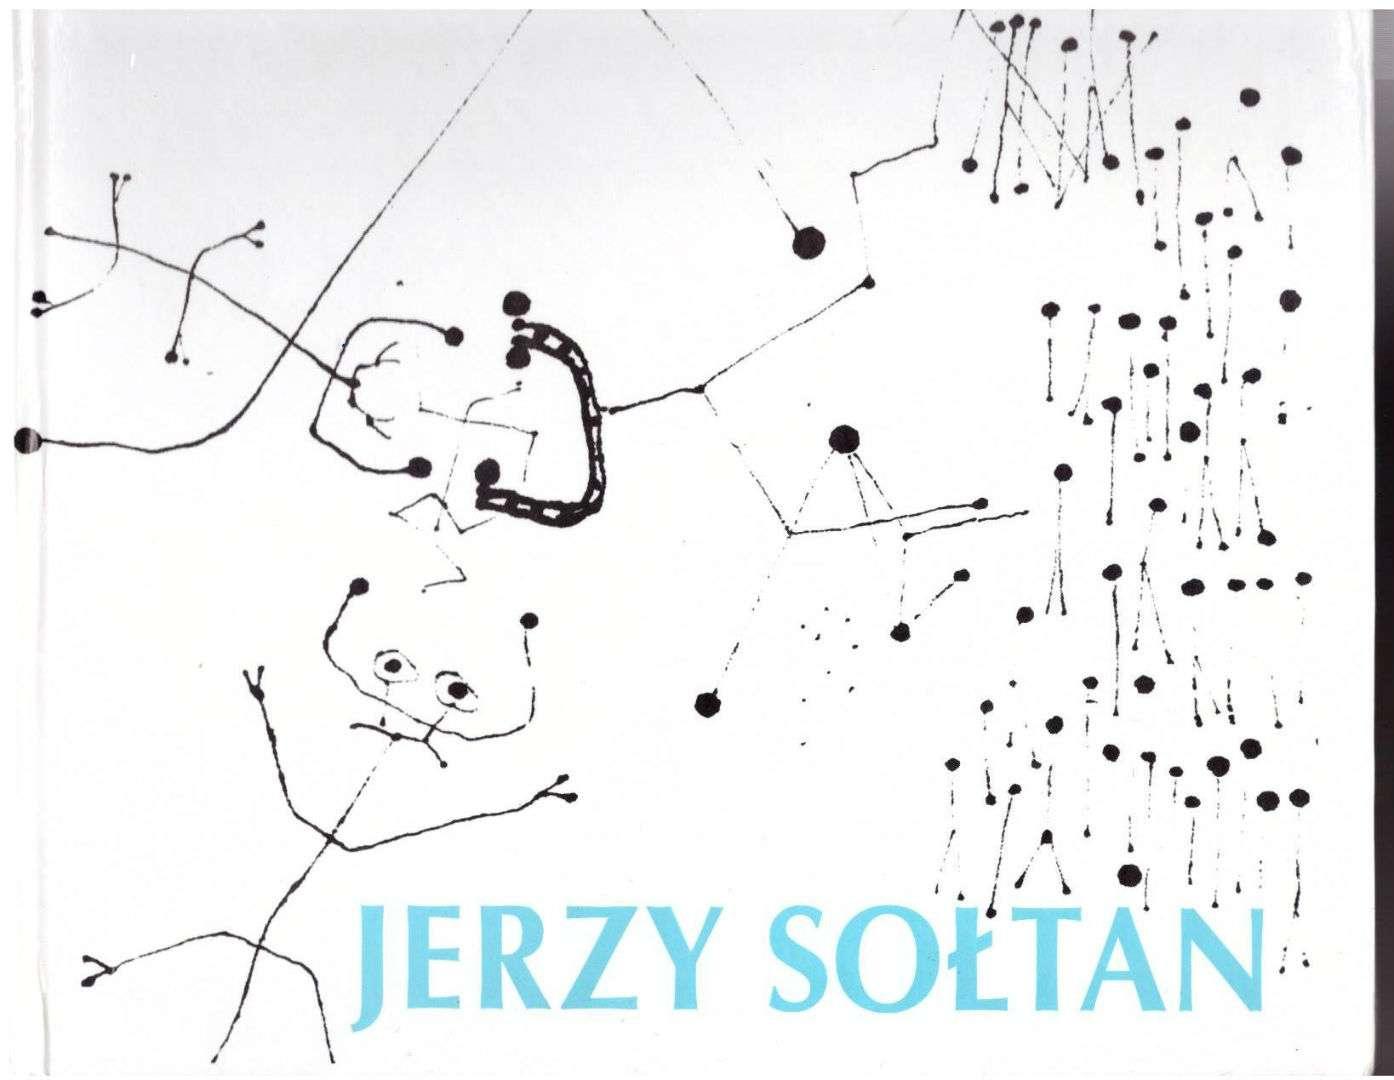 Jerzy Soltan.